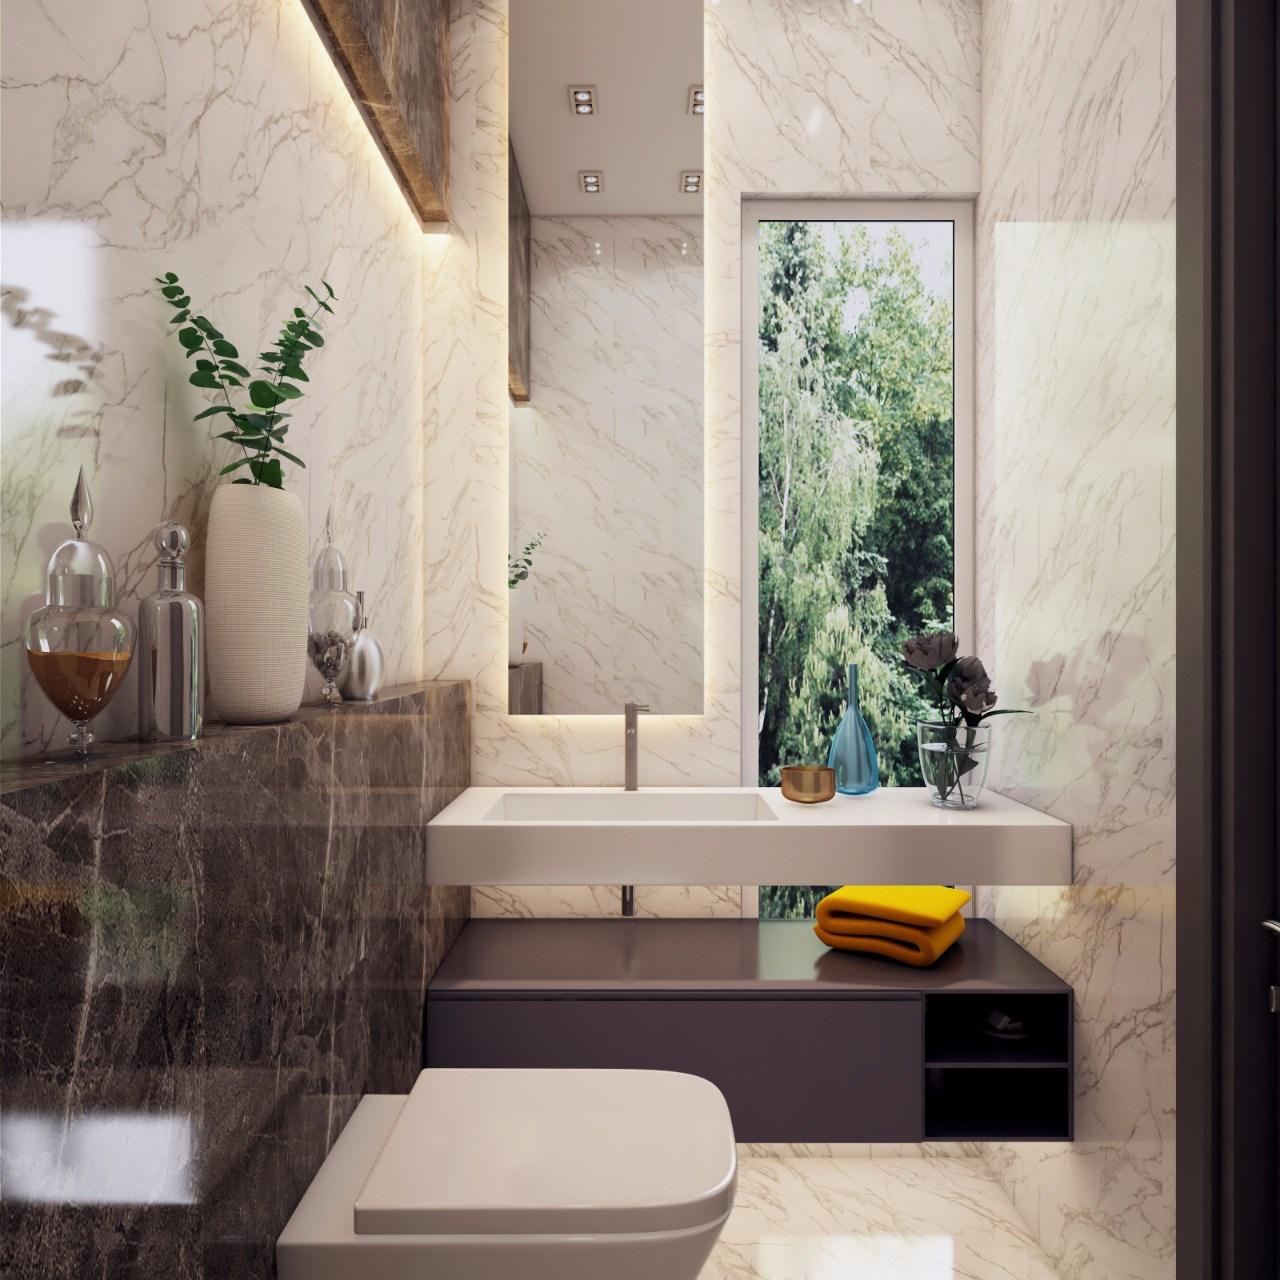 بالصور تصميم حمامات , اجمل ديكورات الحمامات